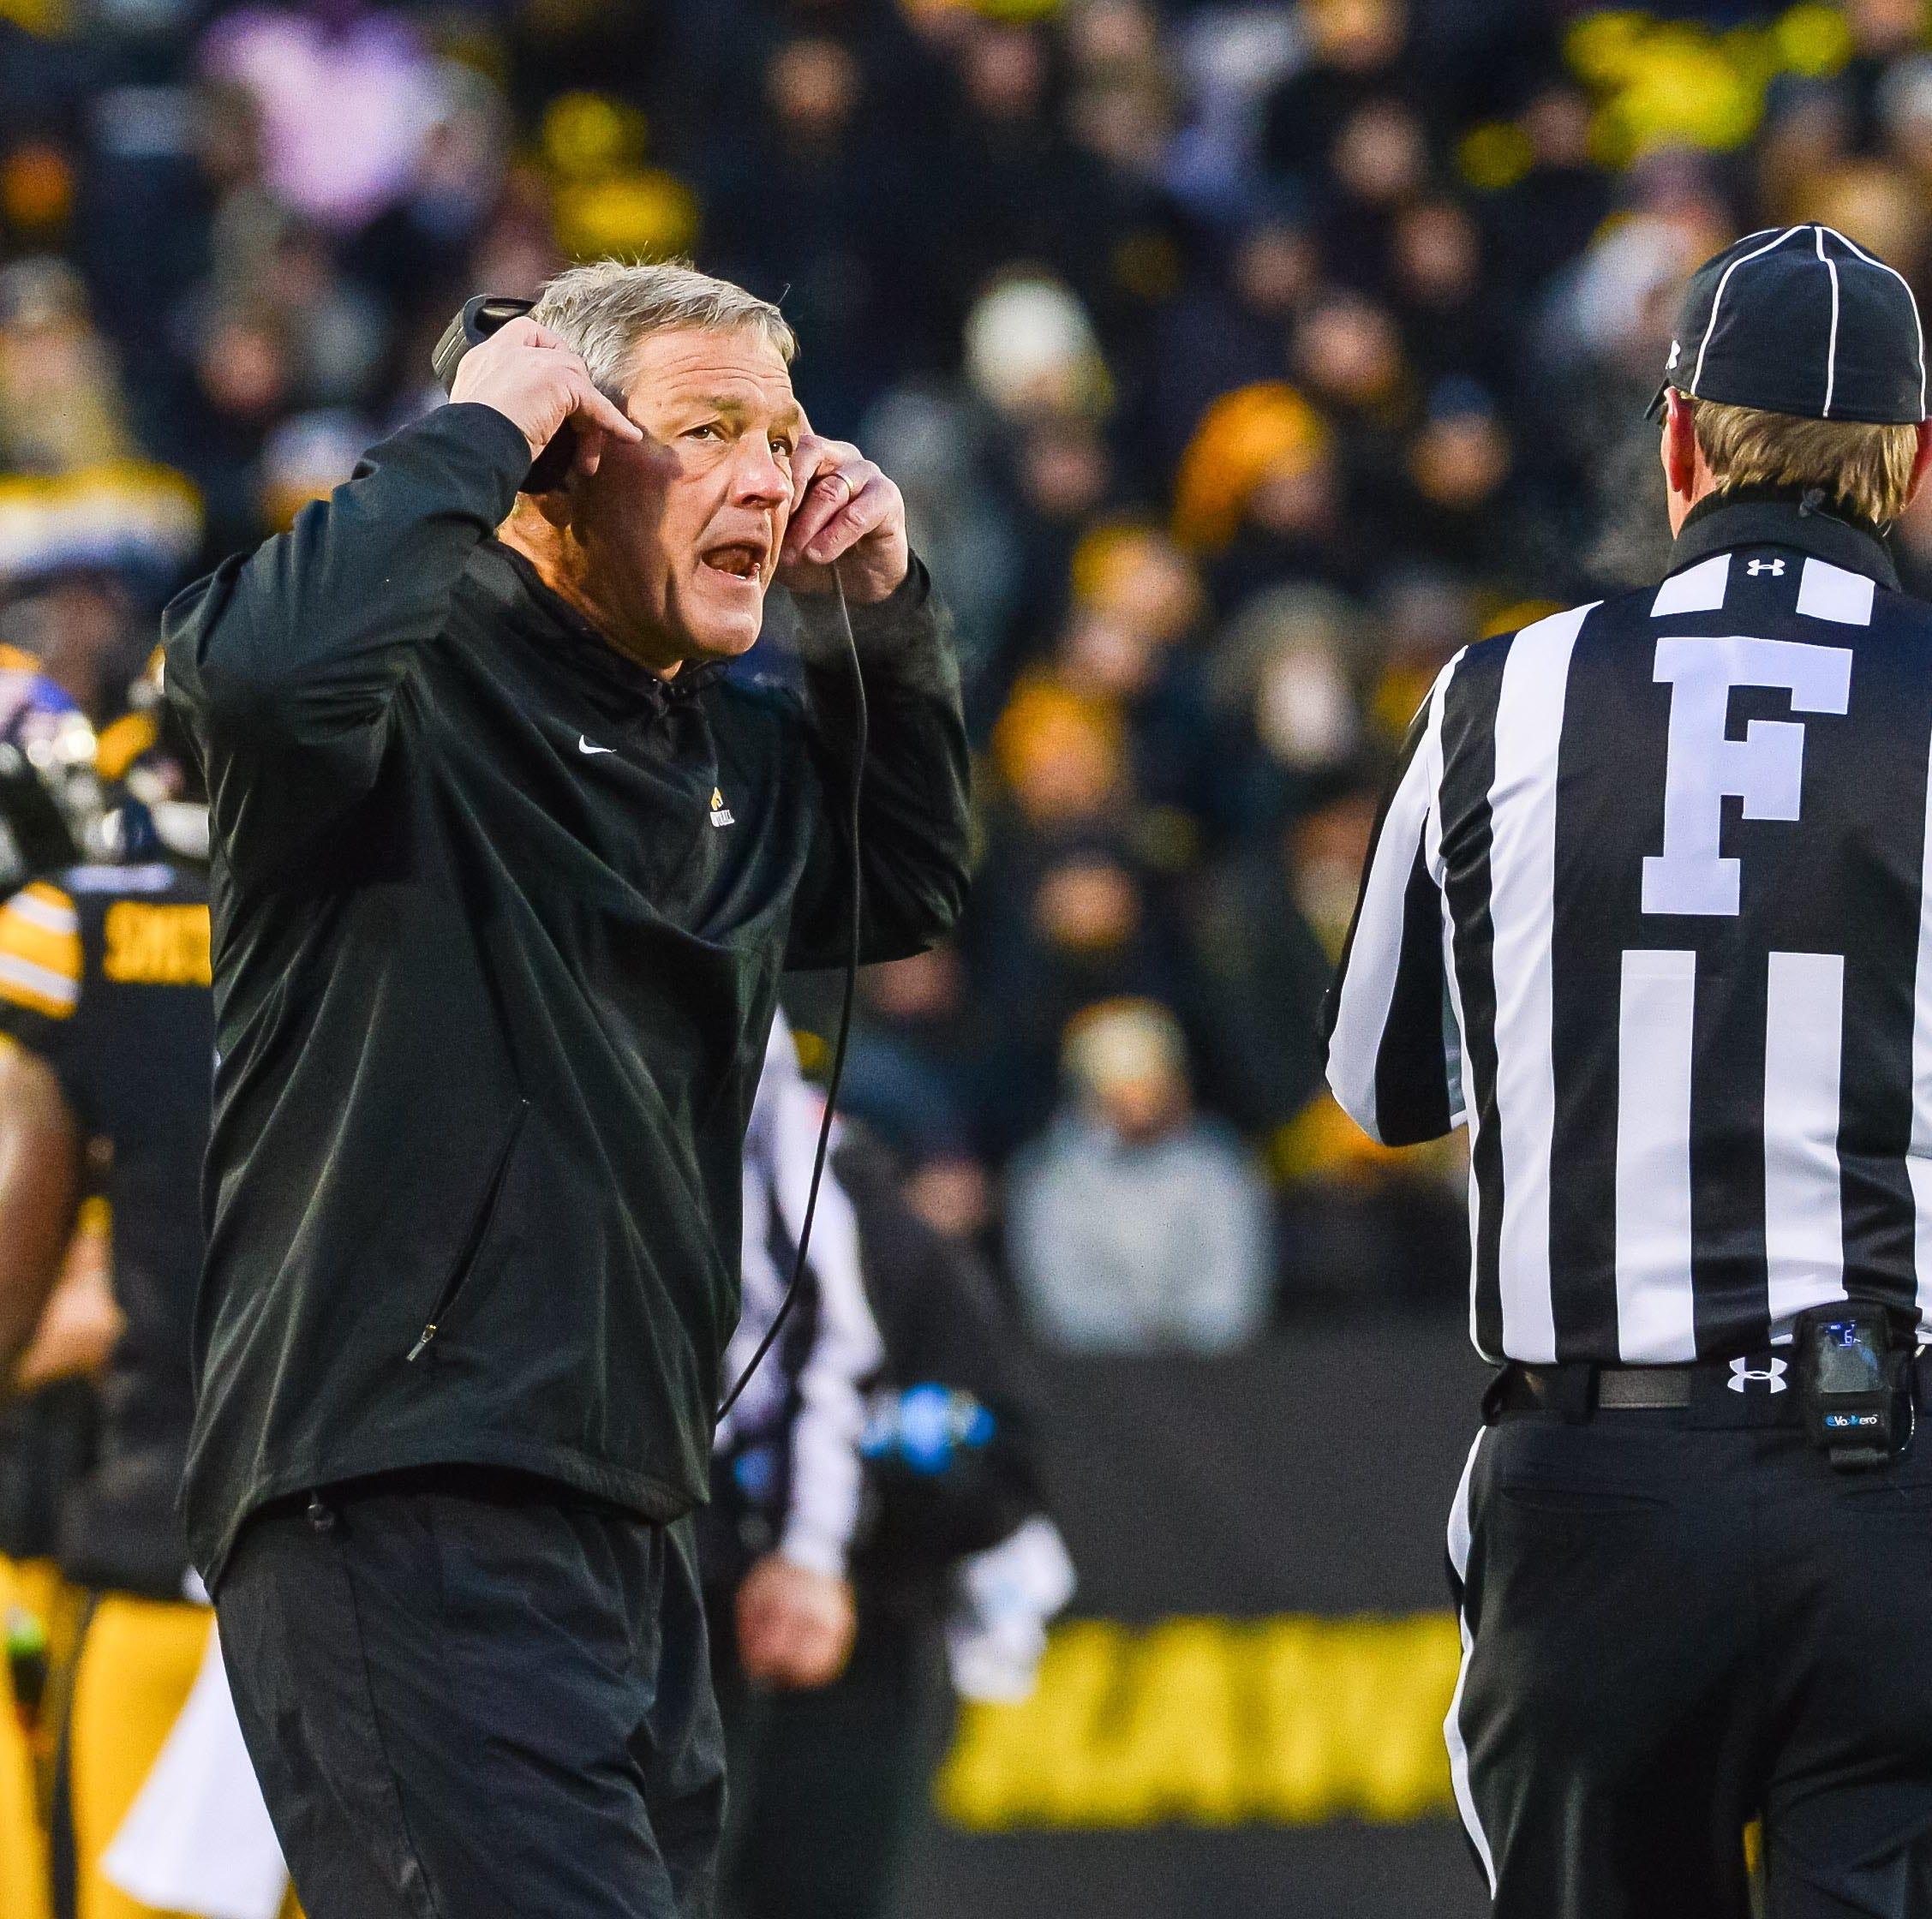 Iowa football: Concrete answers hard to find amid Hawkeyes' November skid